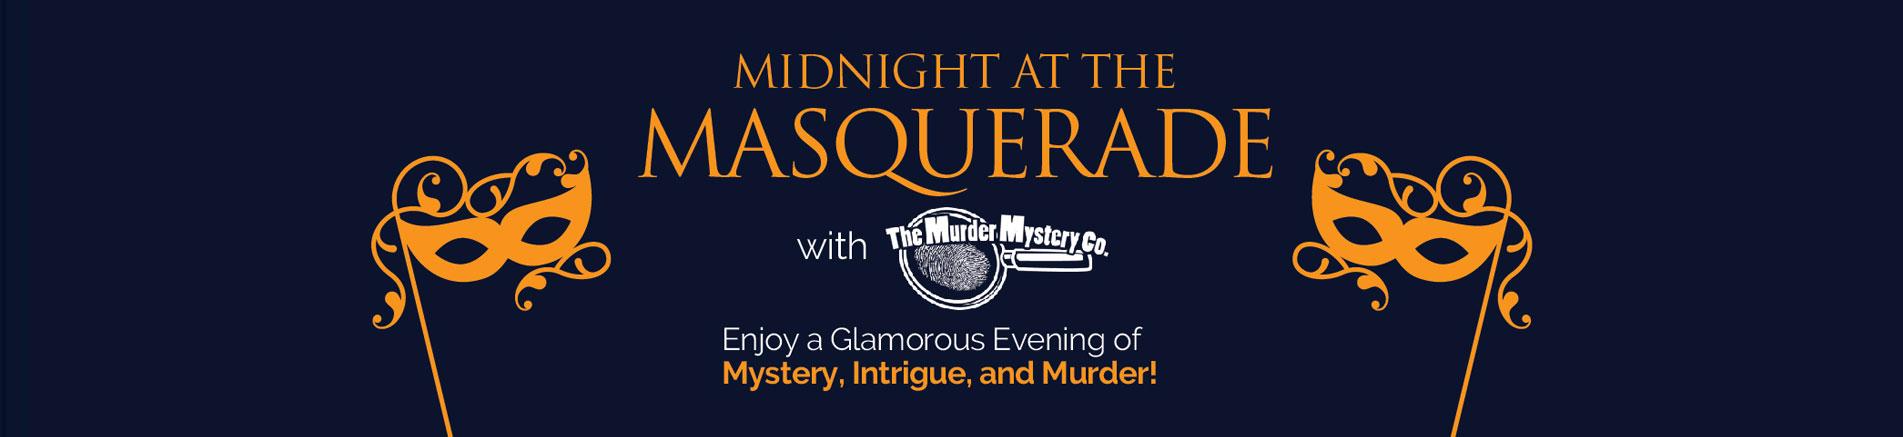 Masquerade-boston-web-banner1